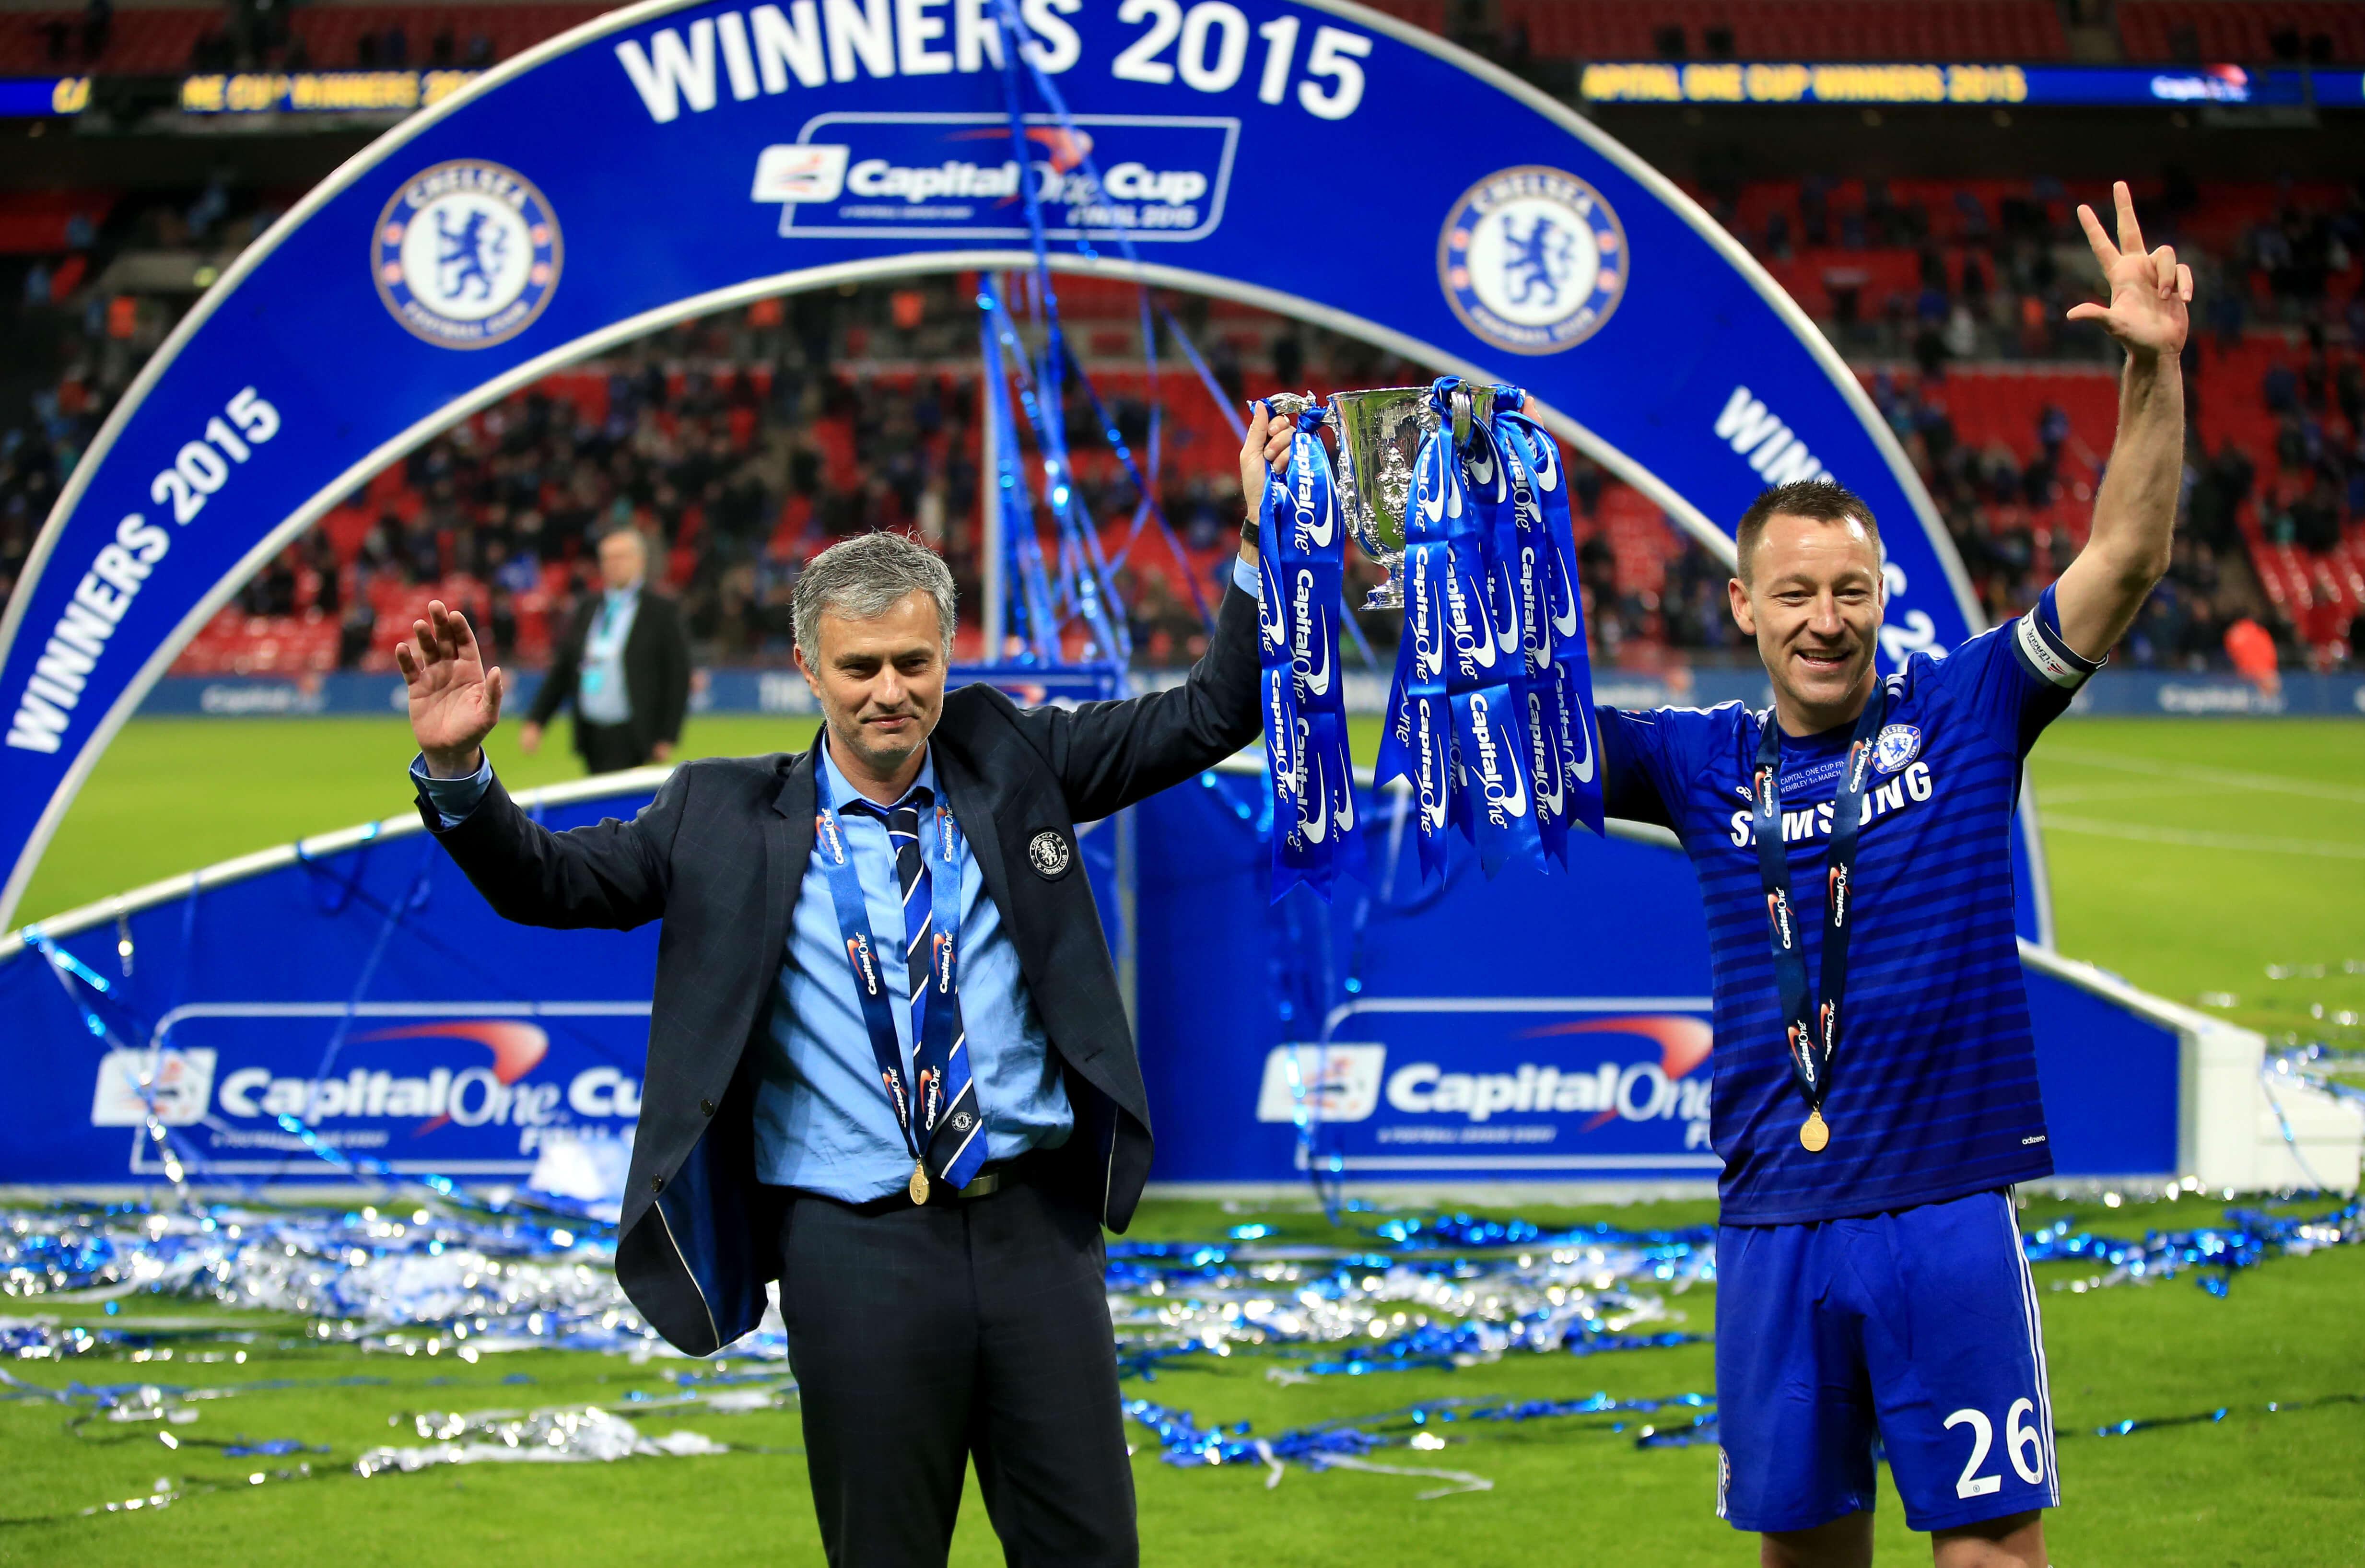 Chelsea v Tottenham Hotspur - Wembley Stadium